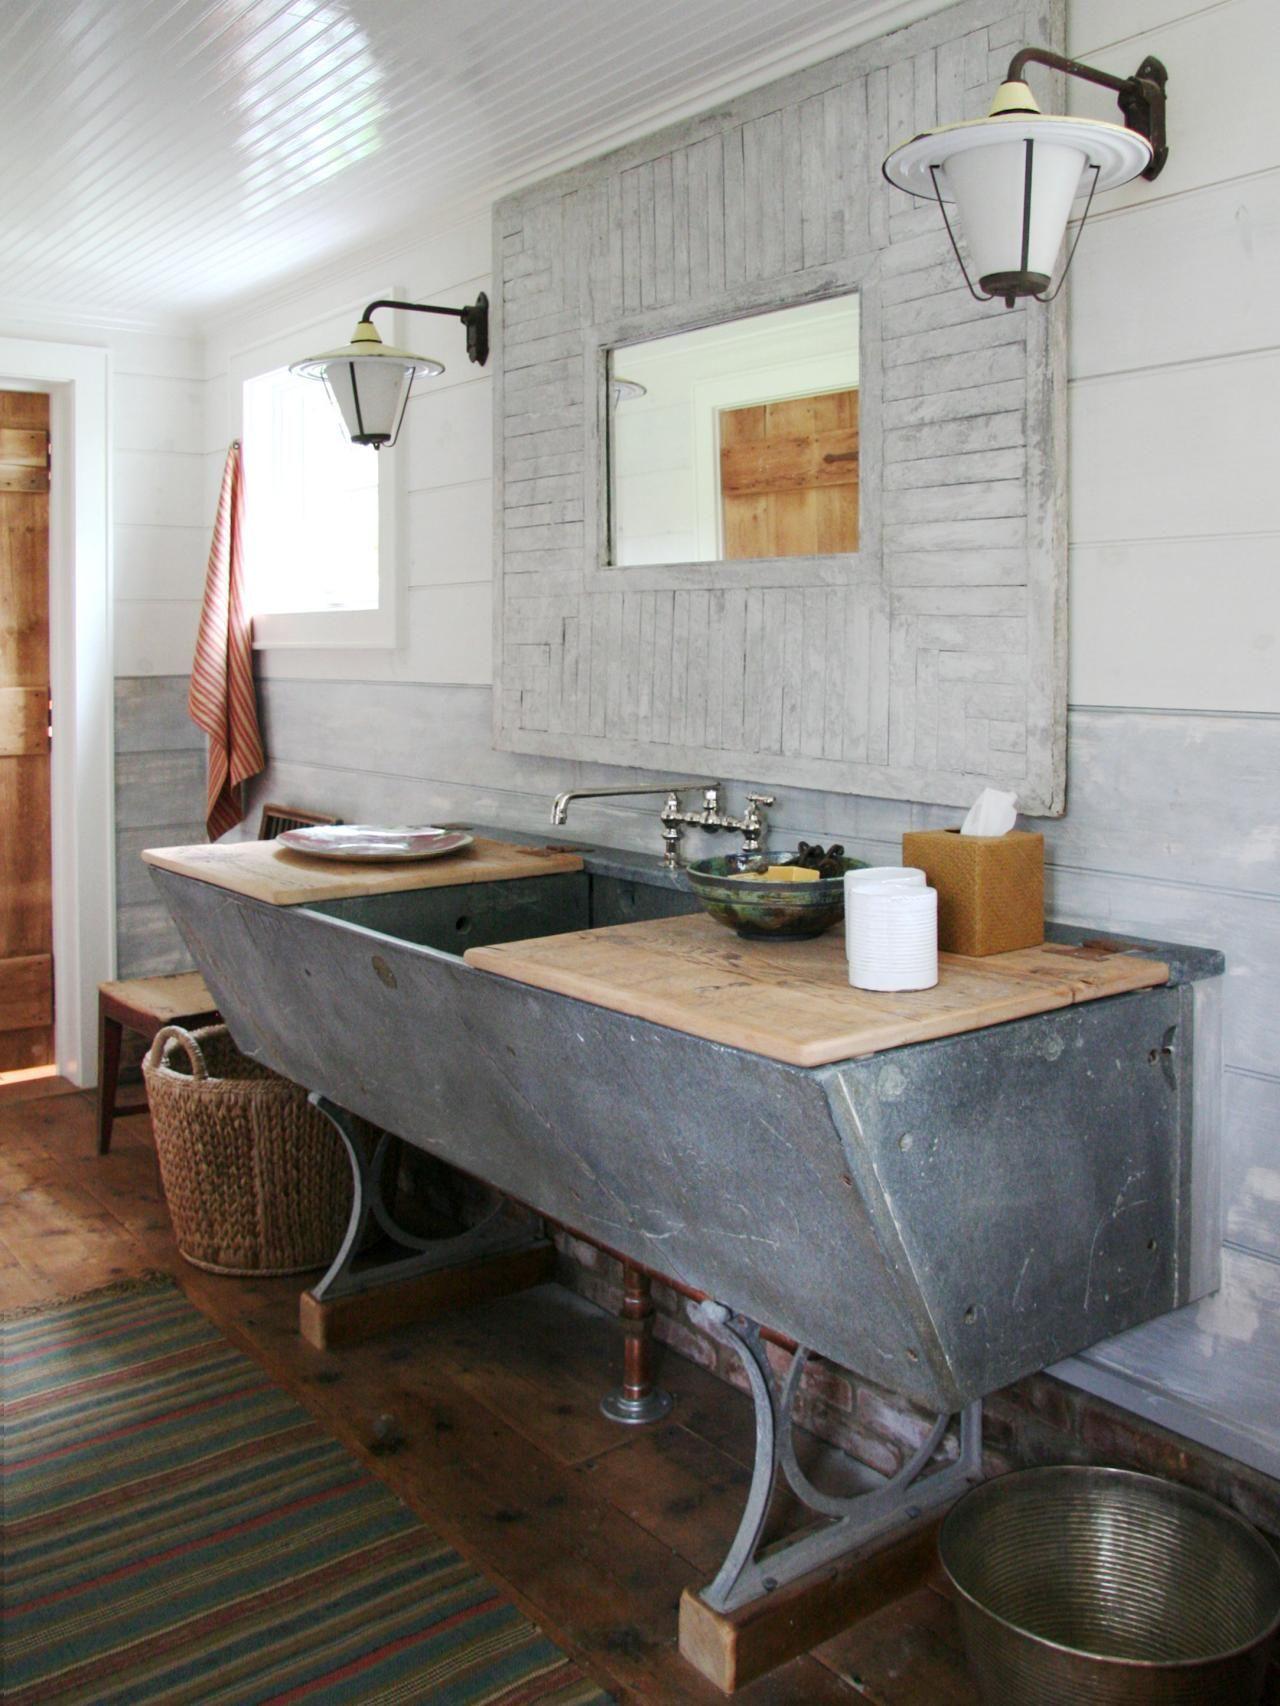 1907 school house farmhouse bathroom san luis obispo by - Perfectly Executed Barn Style Bathroom Decor Galvanized Rustic